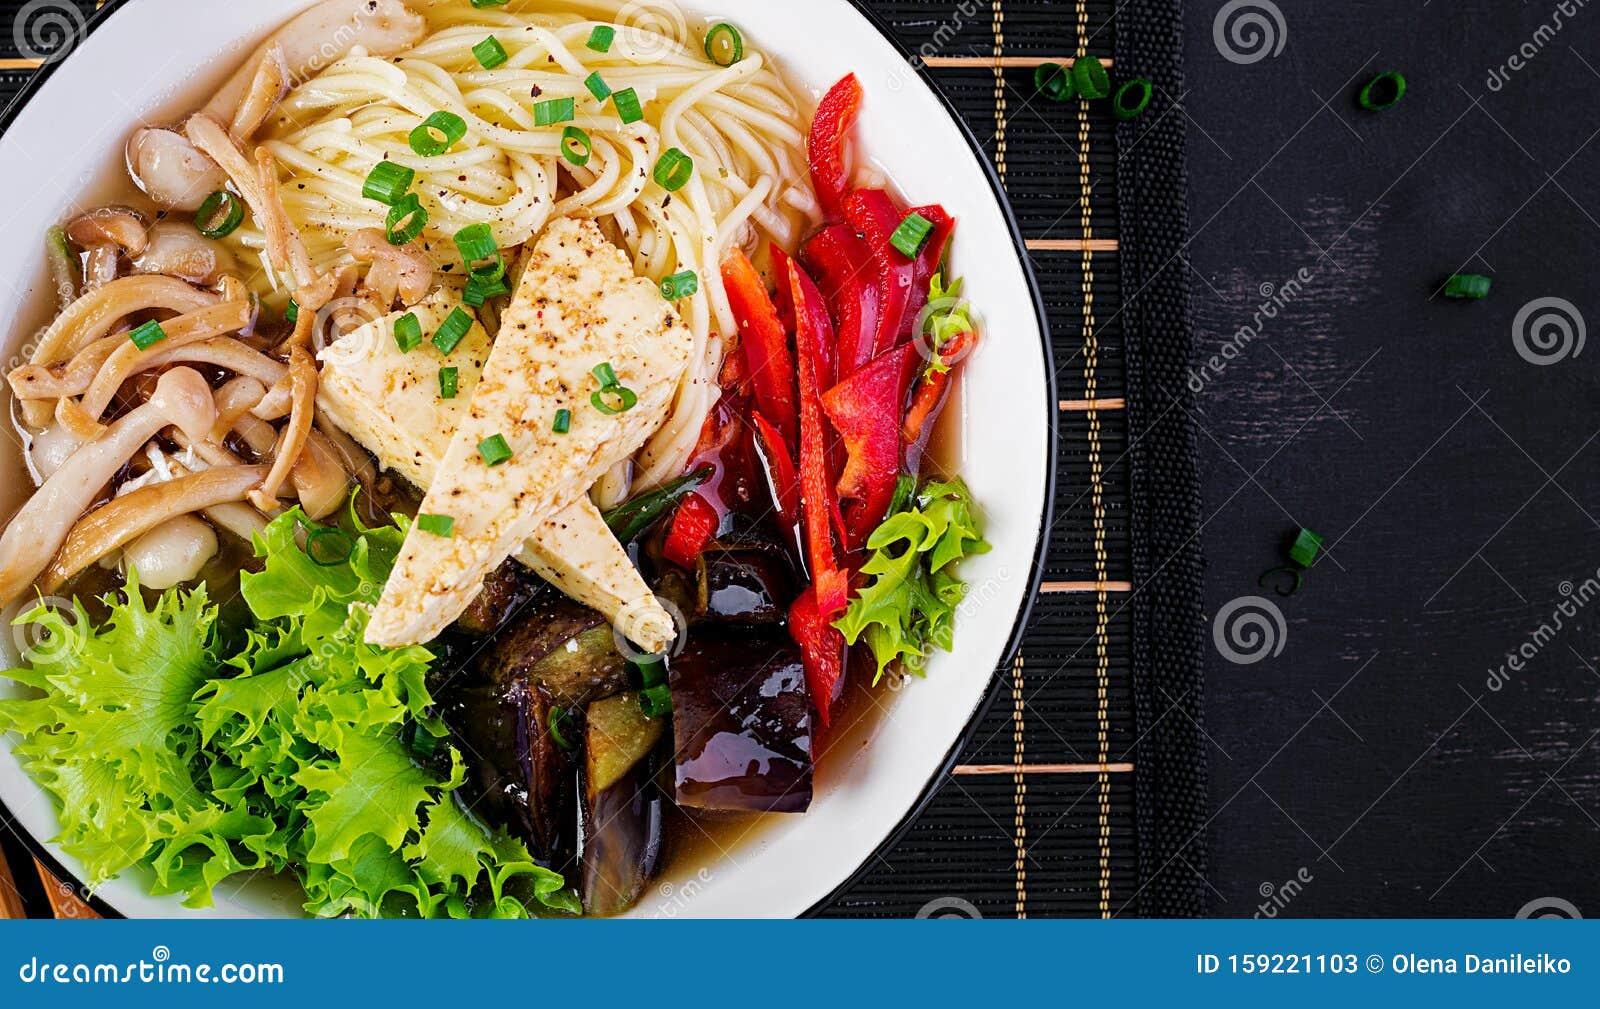 Asian Vegan Noodles Soup With Tofu Cheese Shimeji Mushrooms And Fried Eggplant Stock Image Image Of Fried Japanese 159221103